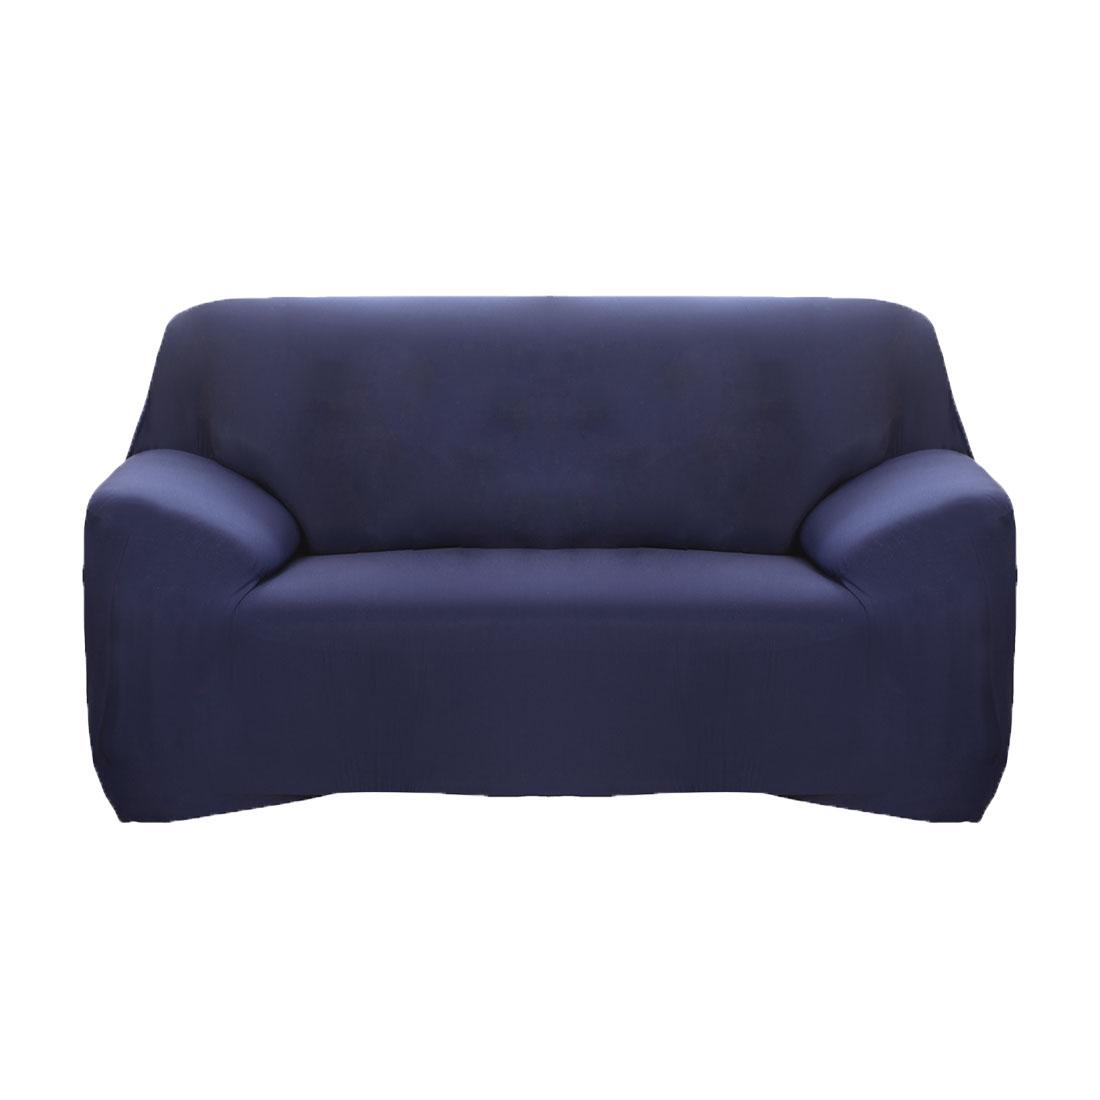 Home Reversible Stretch Furniture Sofa Protector Cover Dark Blue 55''-74''